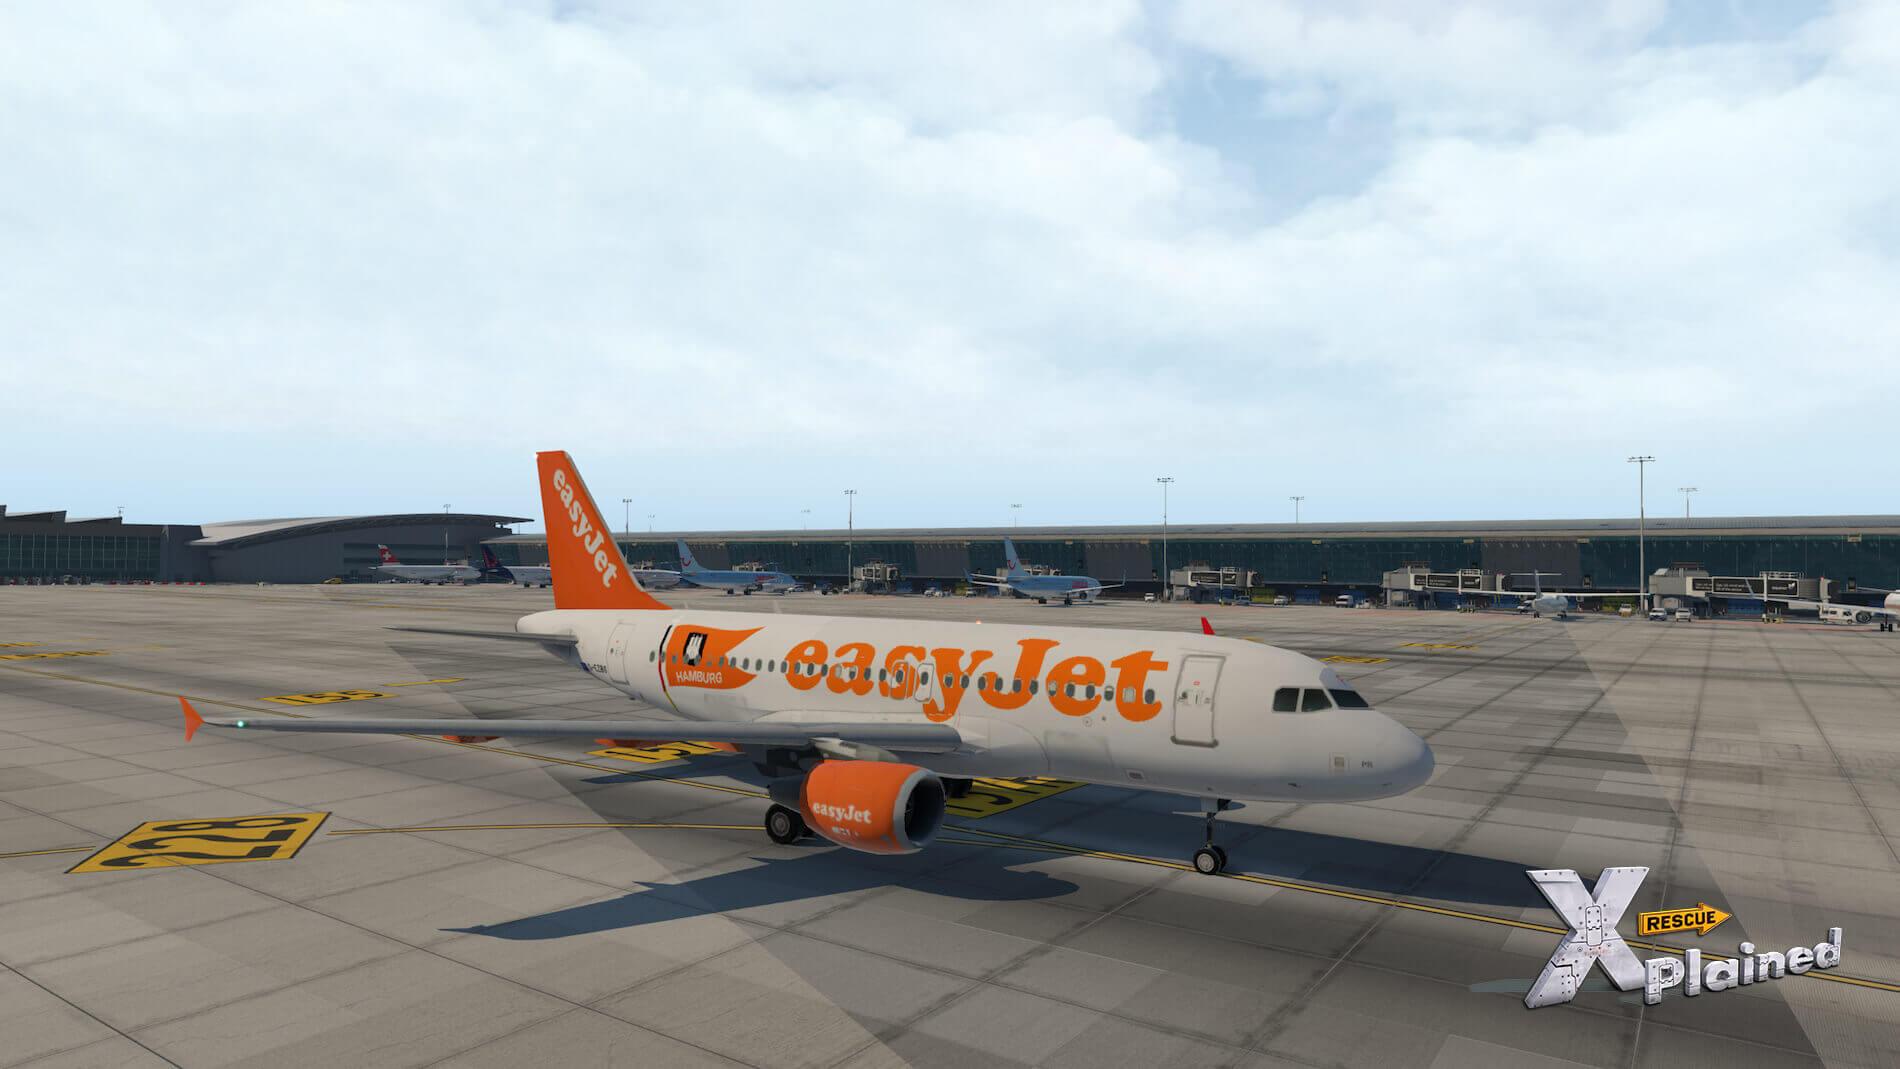 JustSim-EBBR-Airport-18